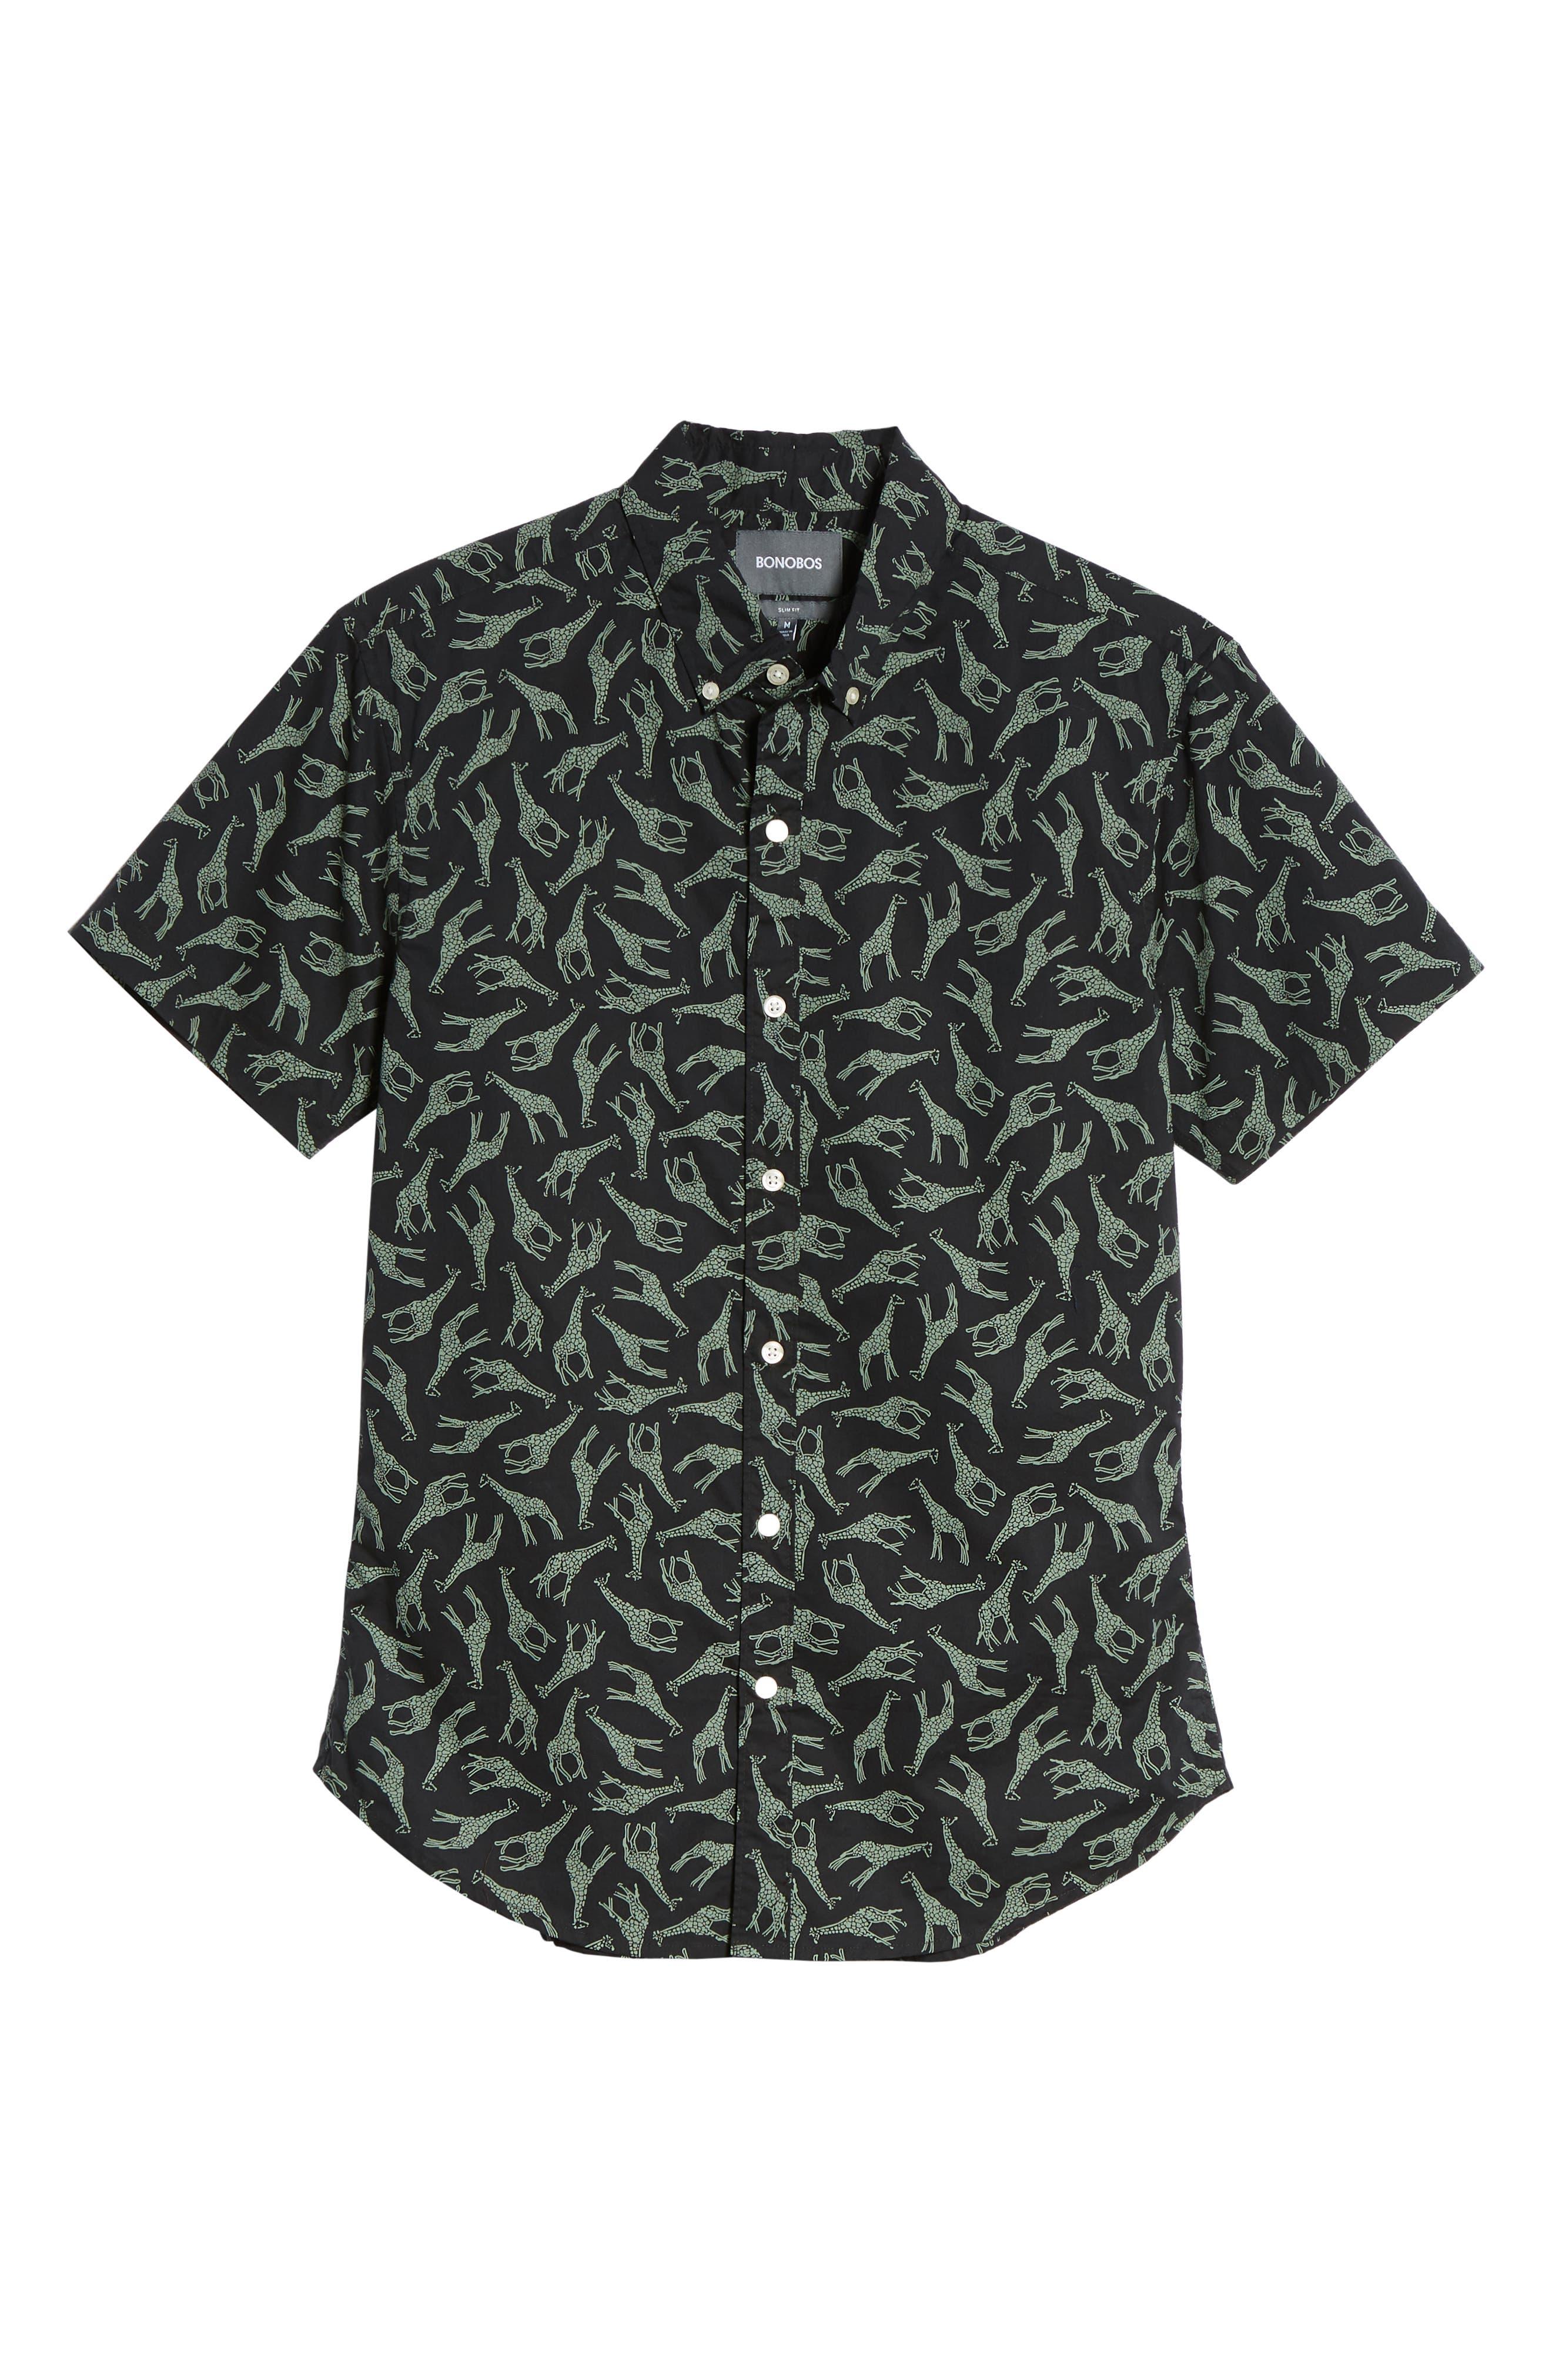 BONOBOS,                             Riviera Slim Fit Giraffe Print Sport Shirt,                             Alternate thumbnail 6, color,                             001